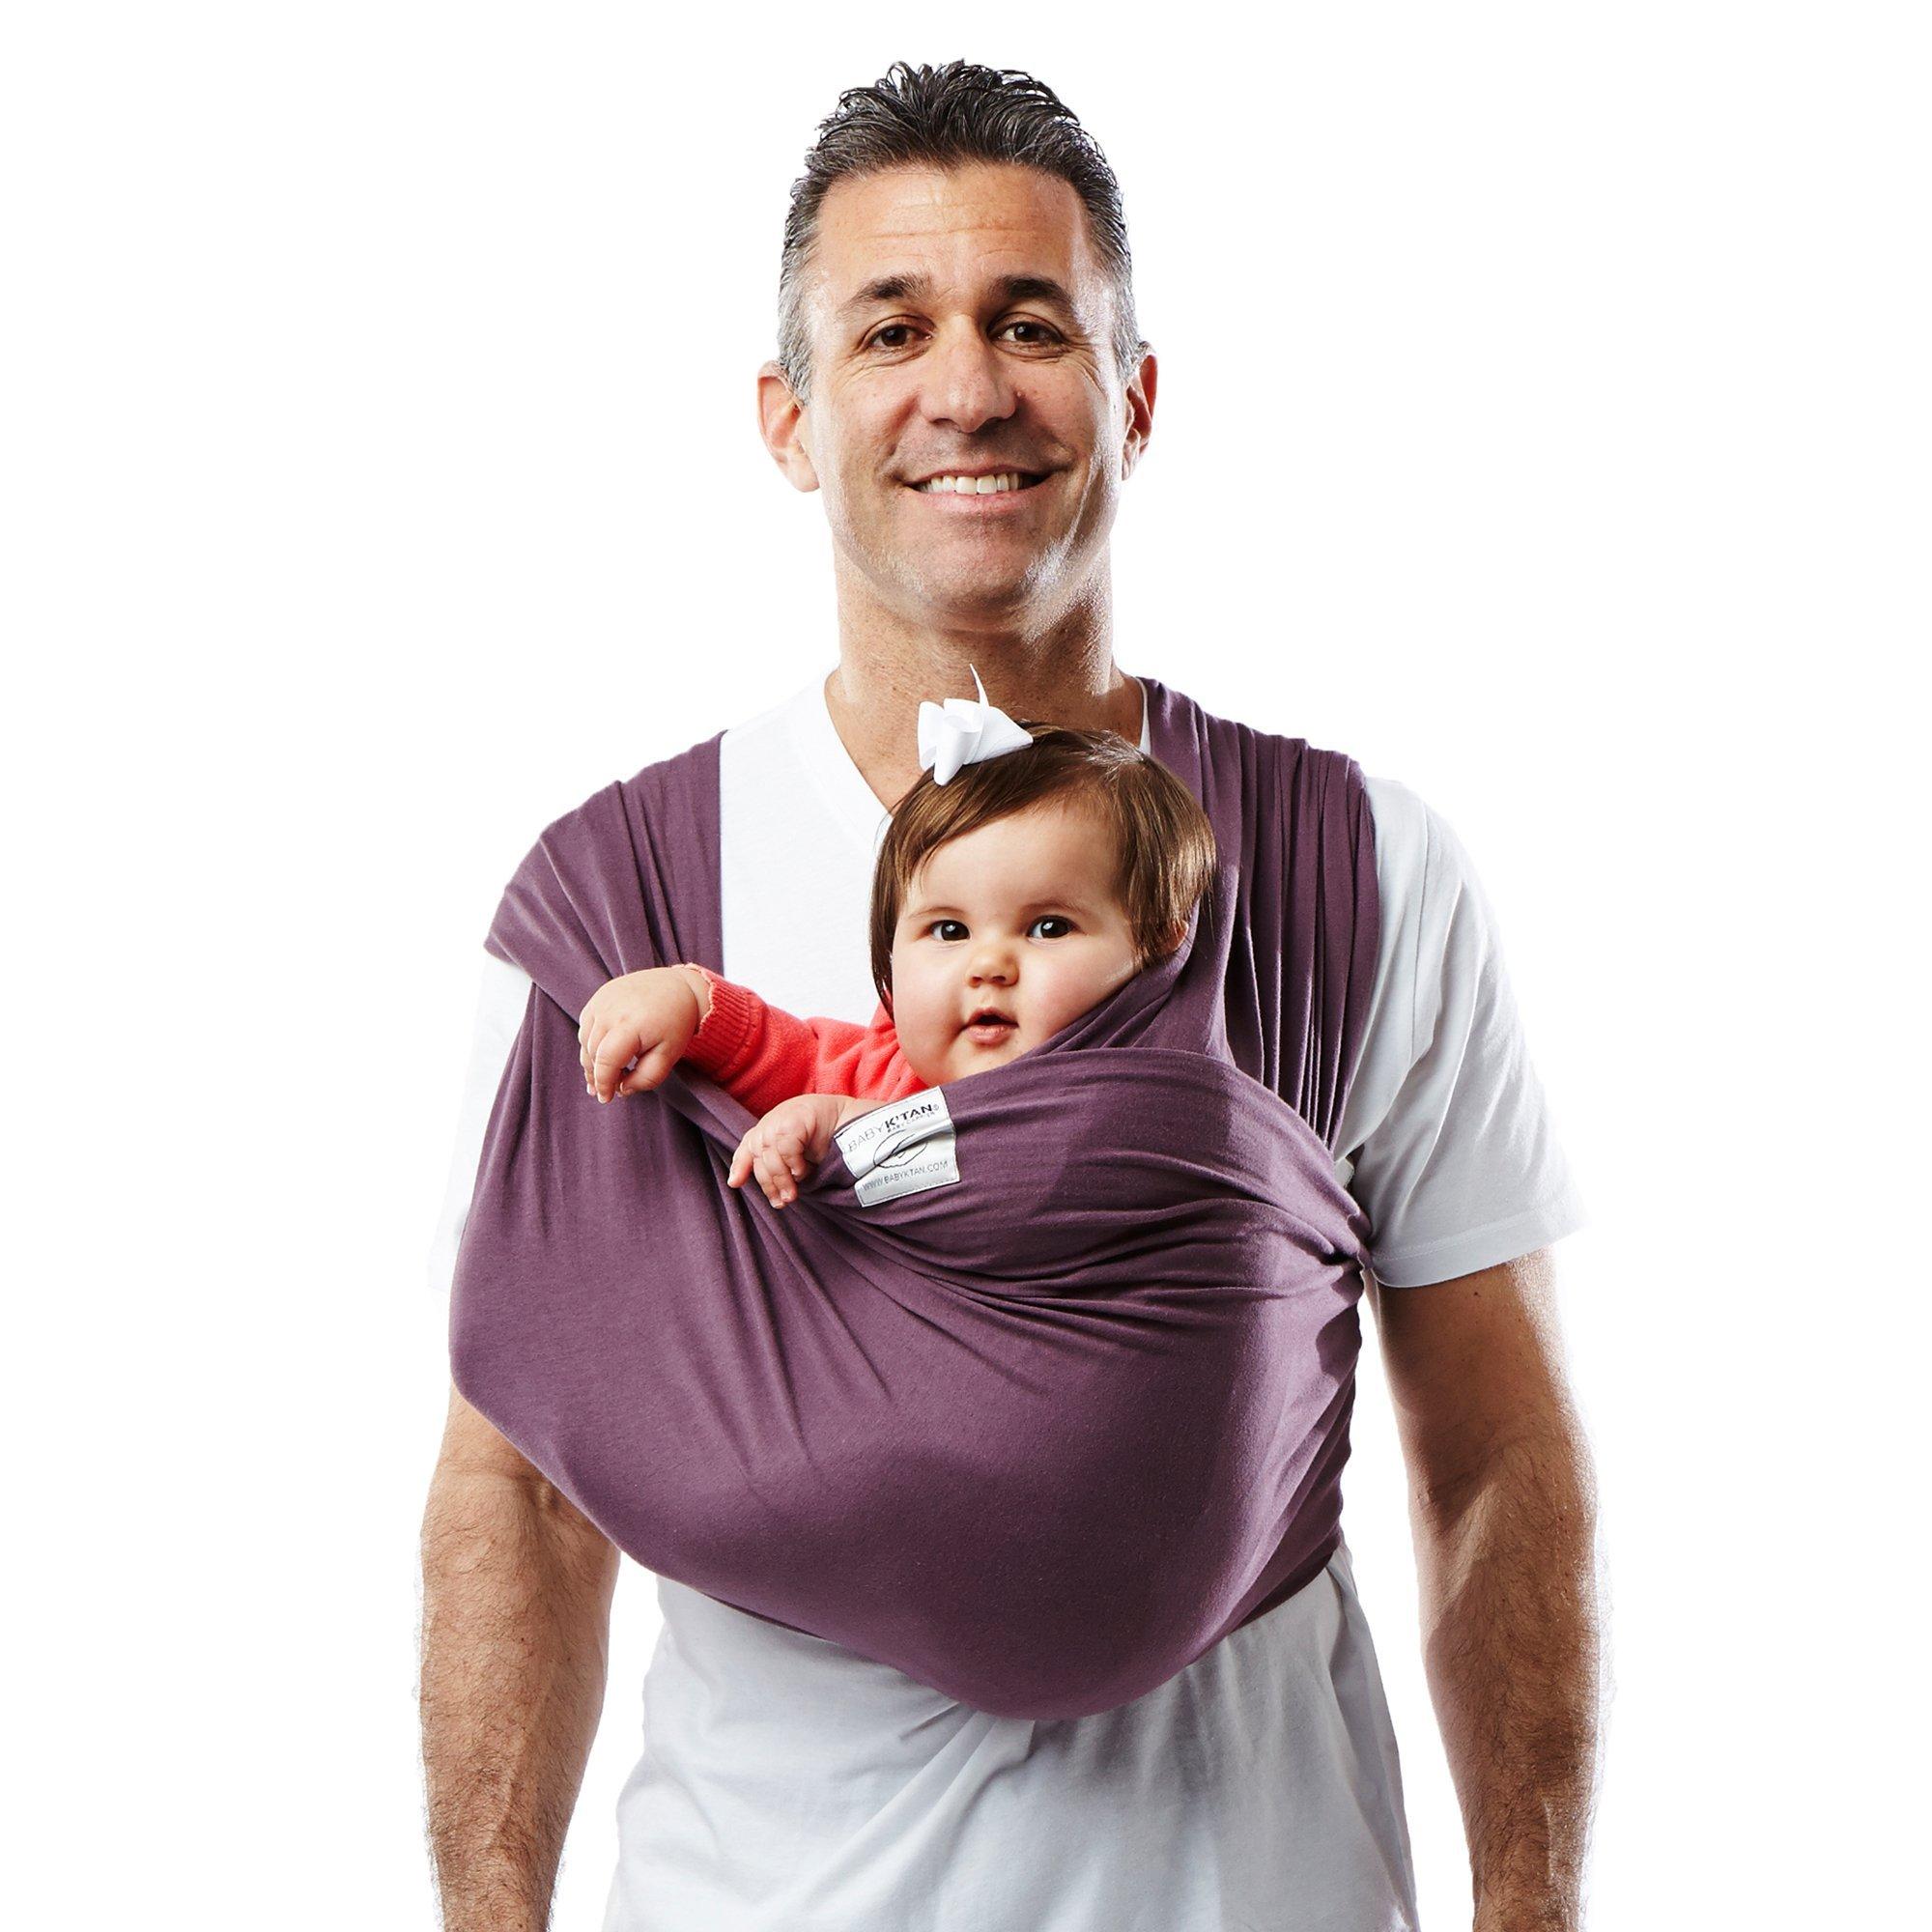 Baby Ktan ORIGINAL Cotton Wrap style Baby Carrier, Eggplant, Medium product image